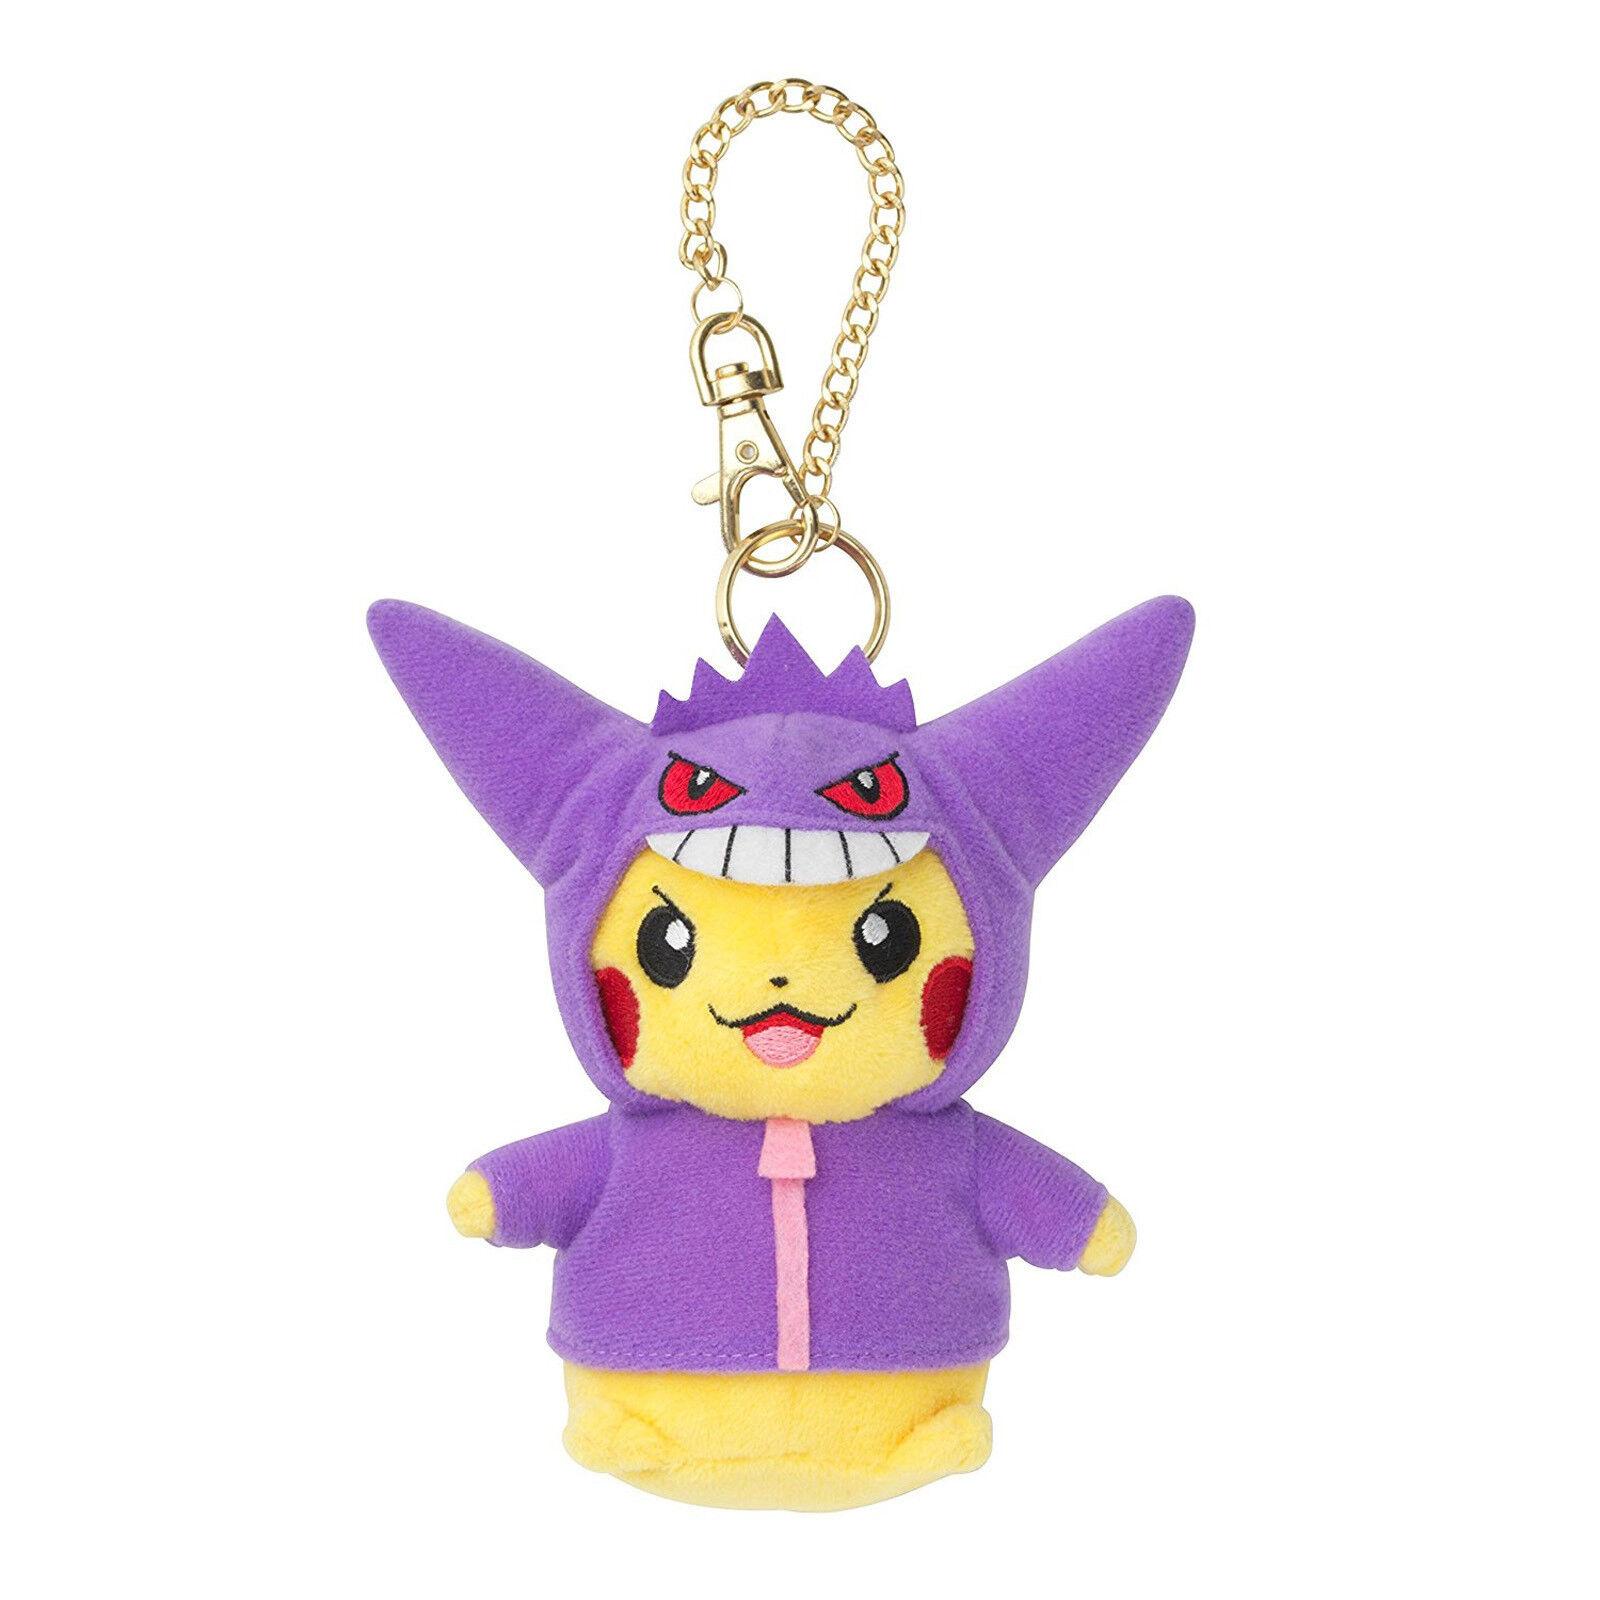 Pokey Center Hallågeen parad 2015 Pikachu Gengar Plush Toys Doll Key Chain